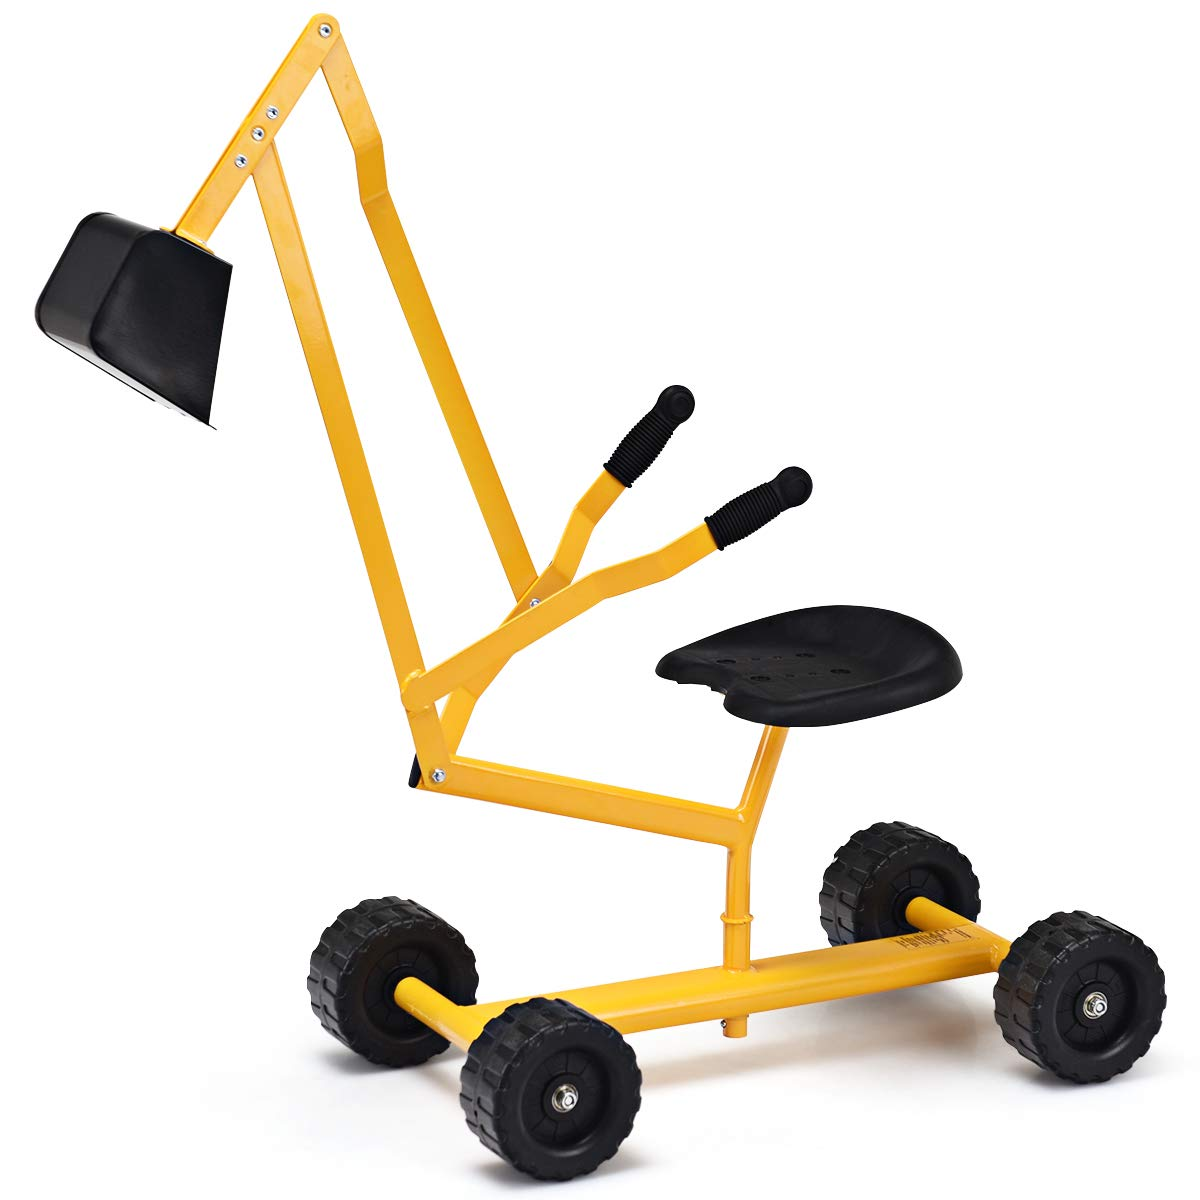 Costzon 8'' Kids Ride-on Sand Digger, Outdoor Sandbox Toy, Heavy Duty Steel Digging Scooper Excavator Crane with 4 Wheels